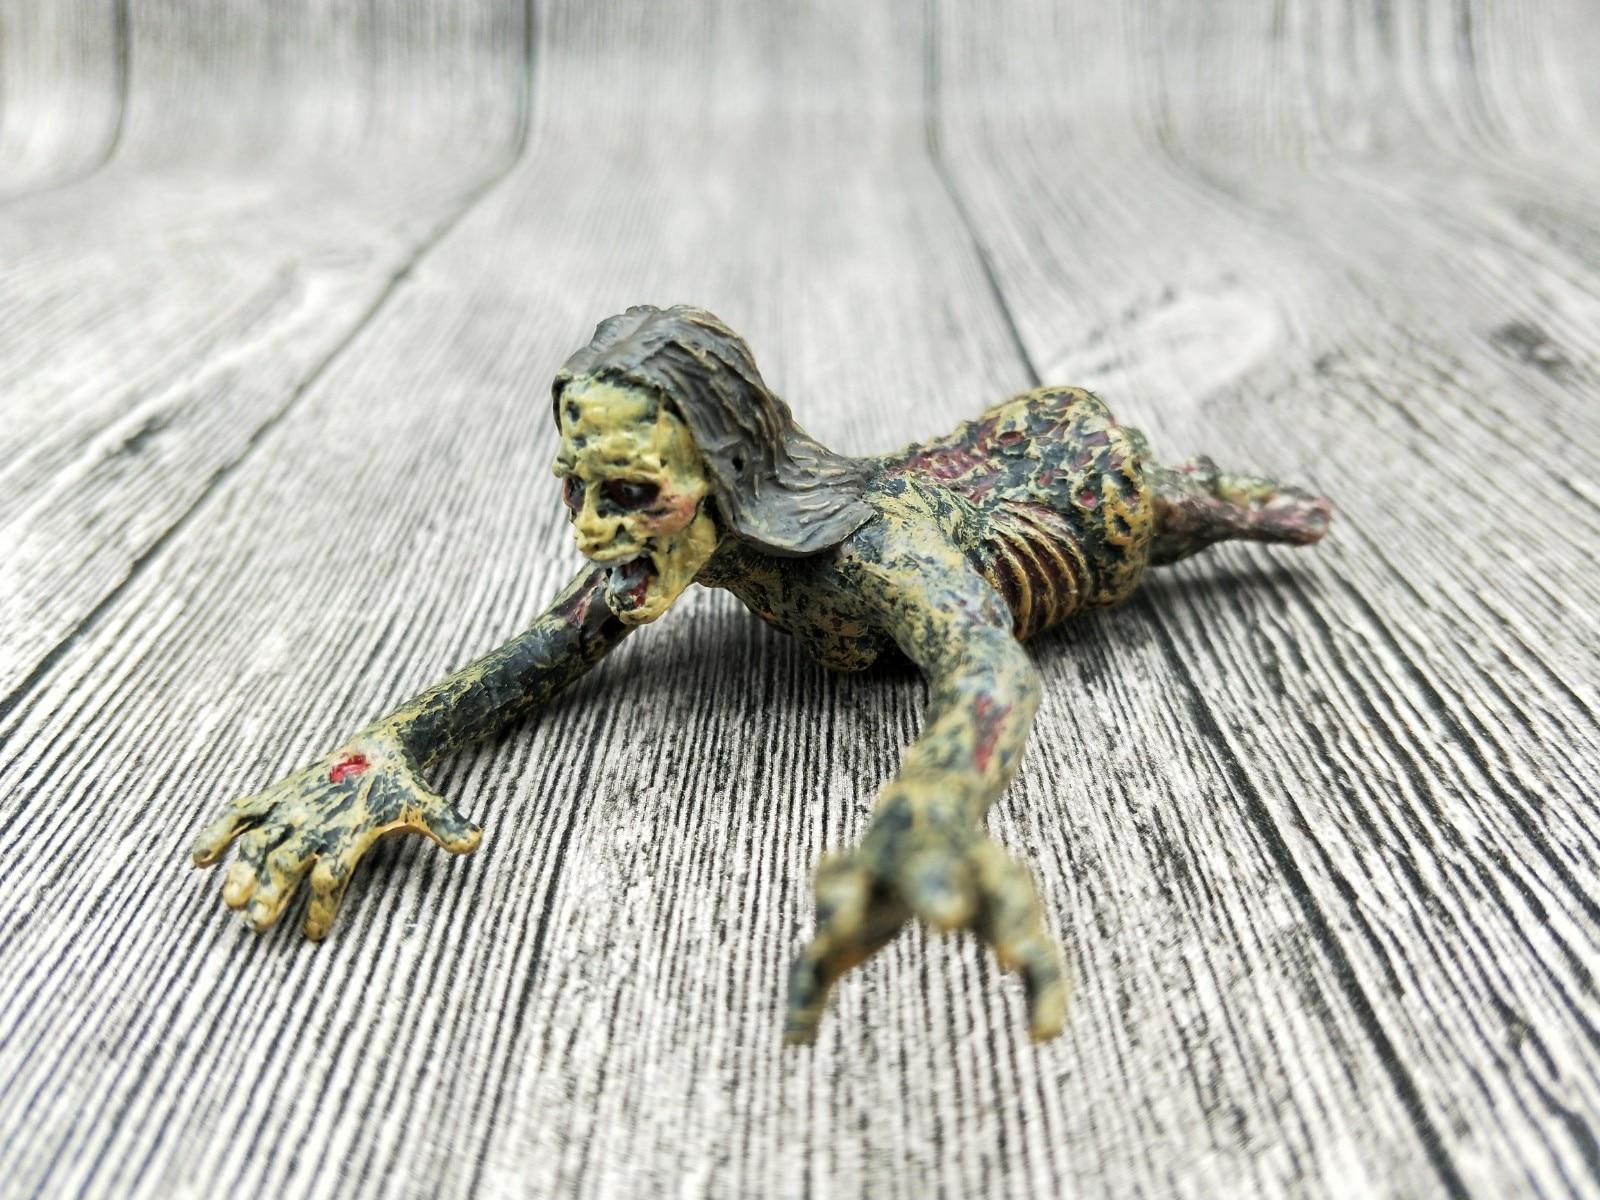 original-garage-kit-9cm-tv-font-b-the-b-font-font-b-walking-b-font-font-b-dead-b-font--font-b-dead-b-font-walker-zombie-usb-action-figure-collectible-model-loose-toy-kids-gifts